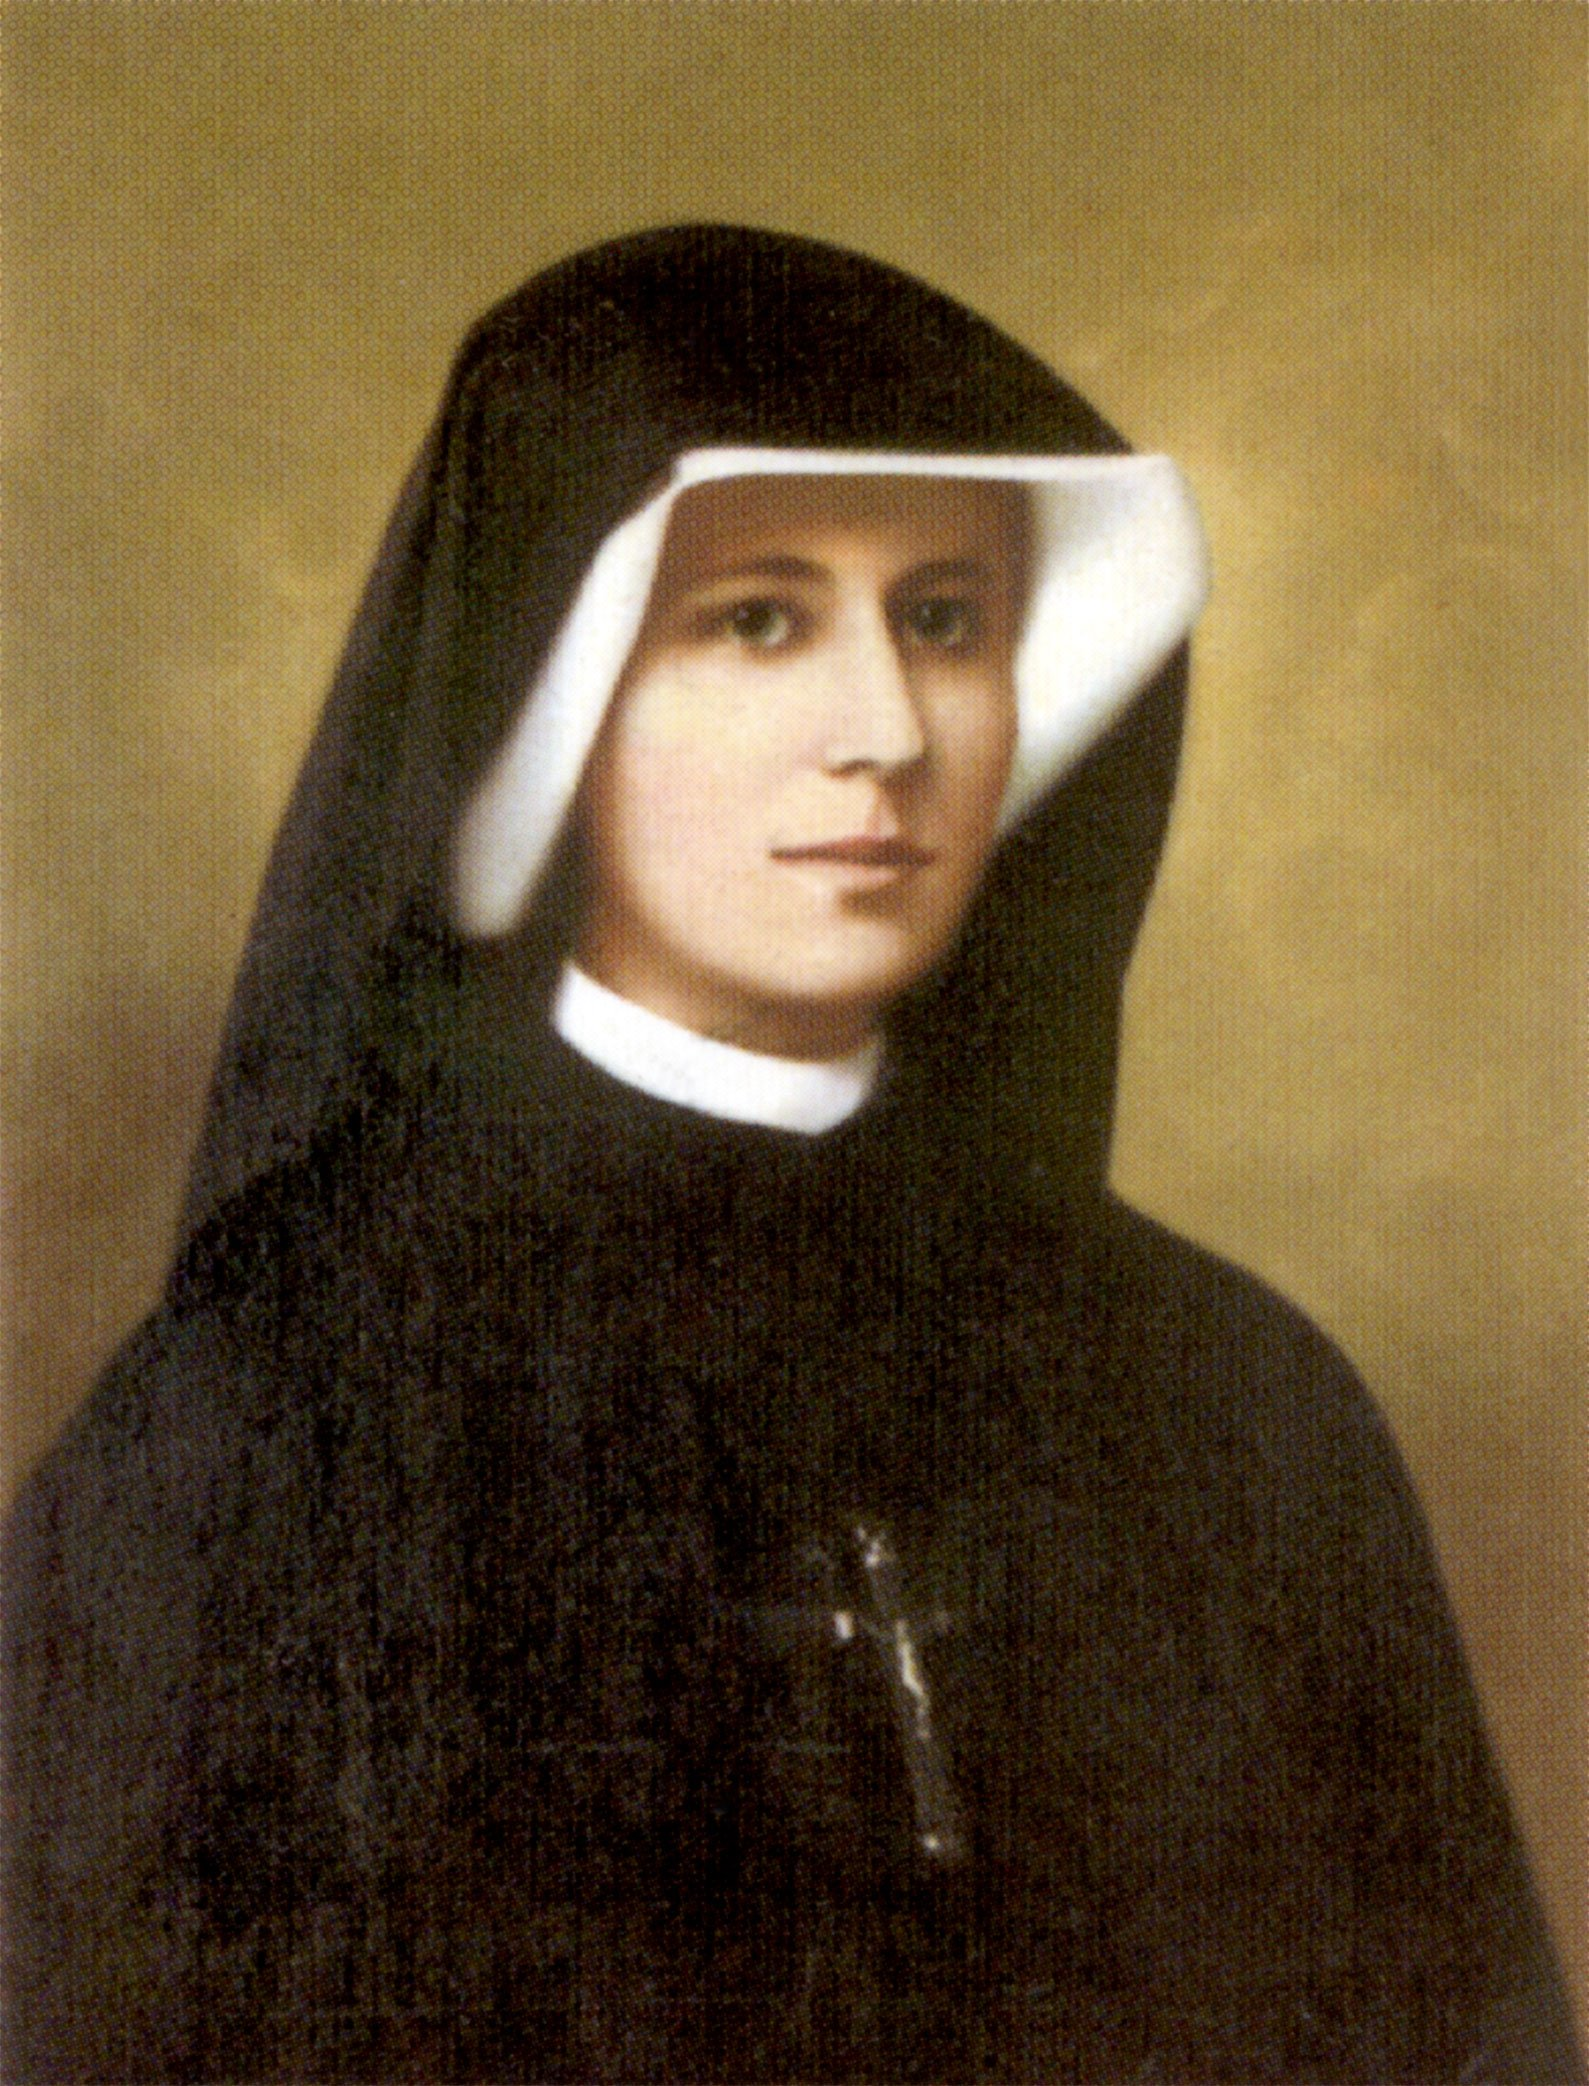 Faustina Kowalska